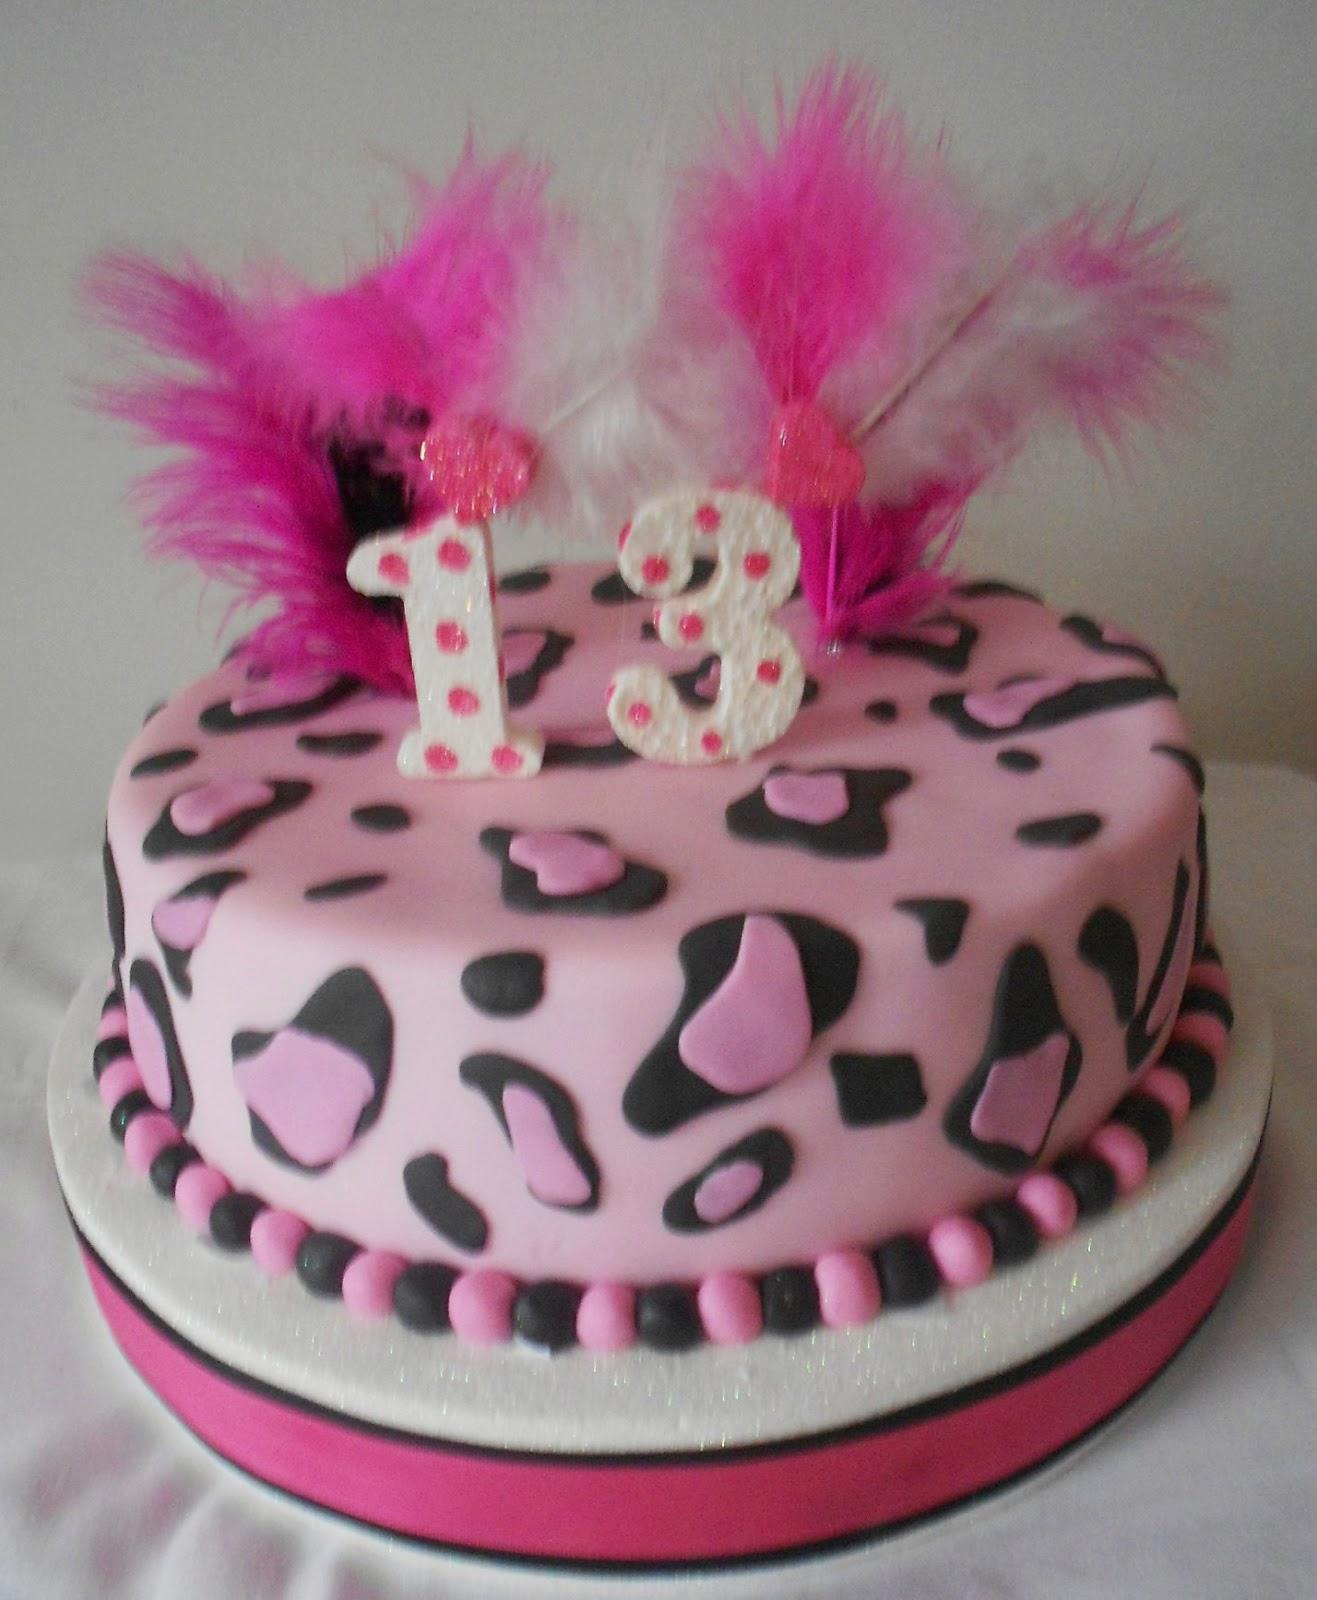 Pin Torta Animal Print Leopardo Paso A Pasopng on Pinterest